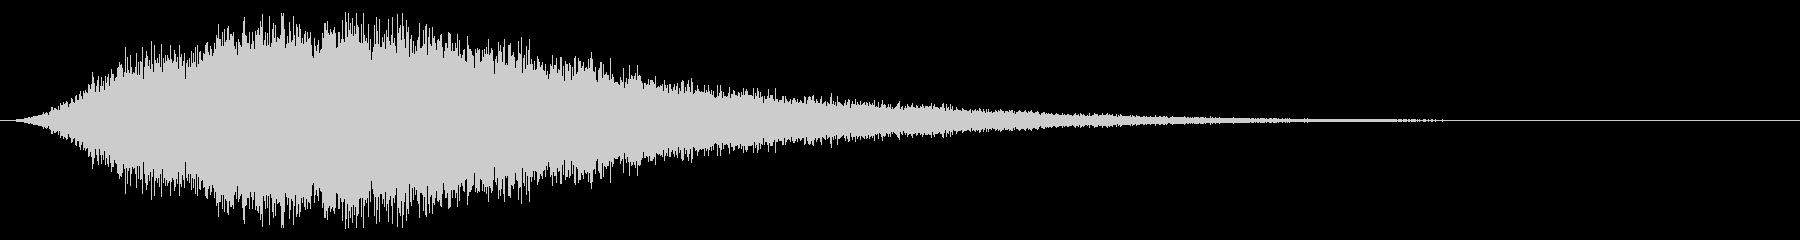 Dark_Attack-49の未再生の波形